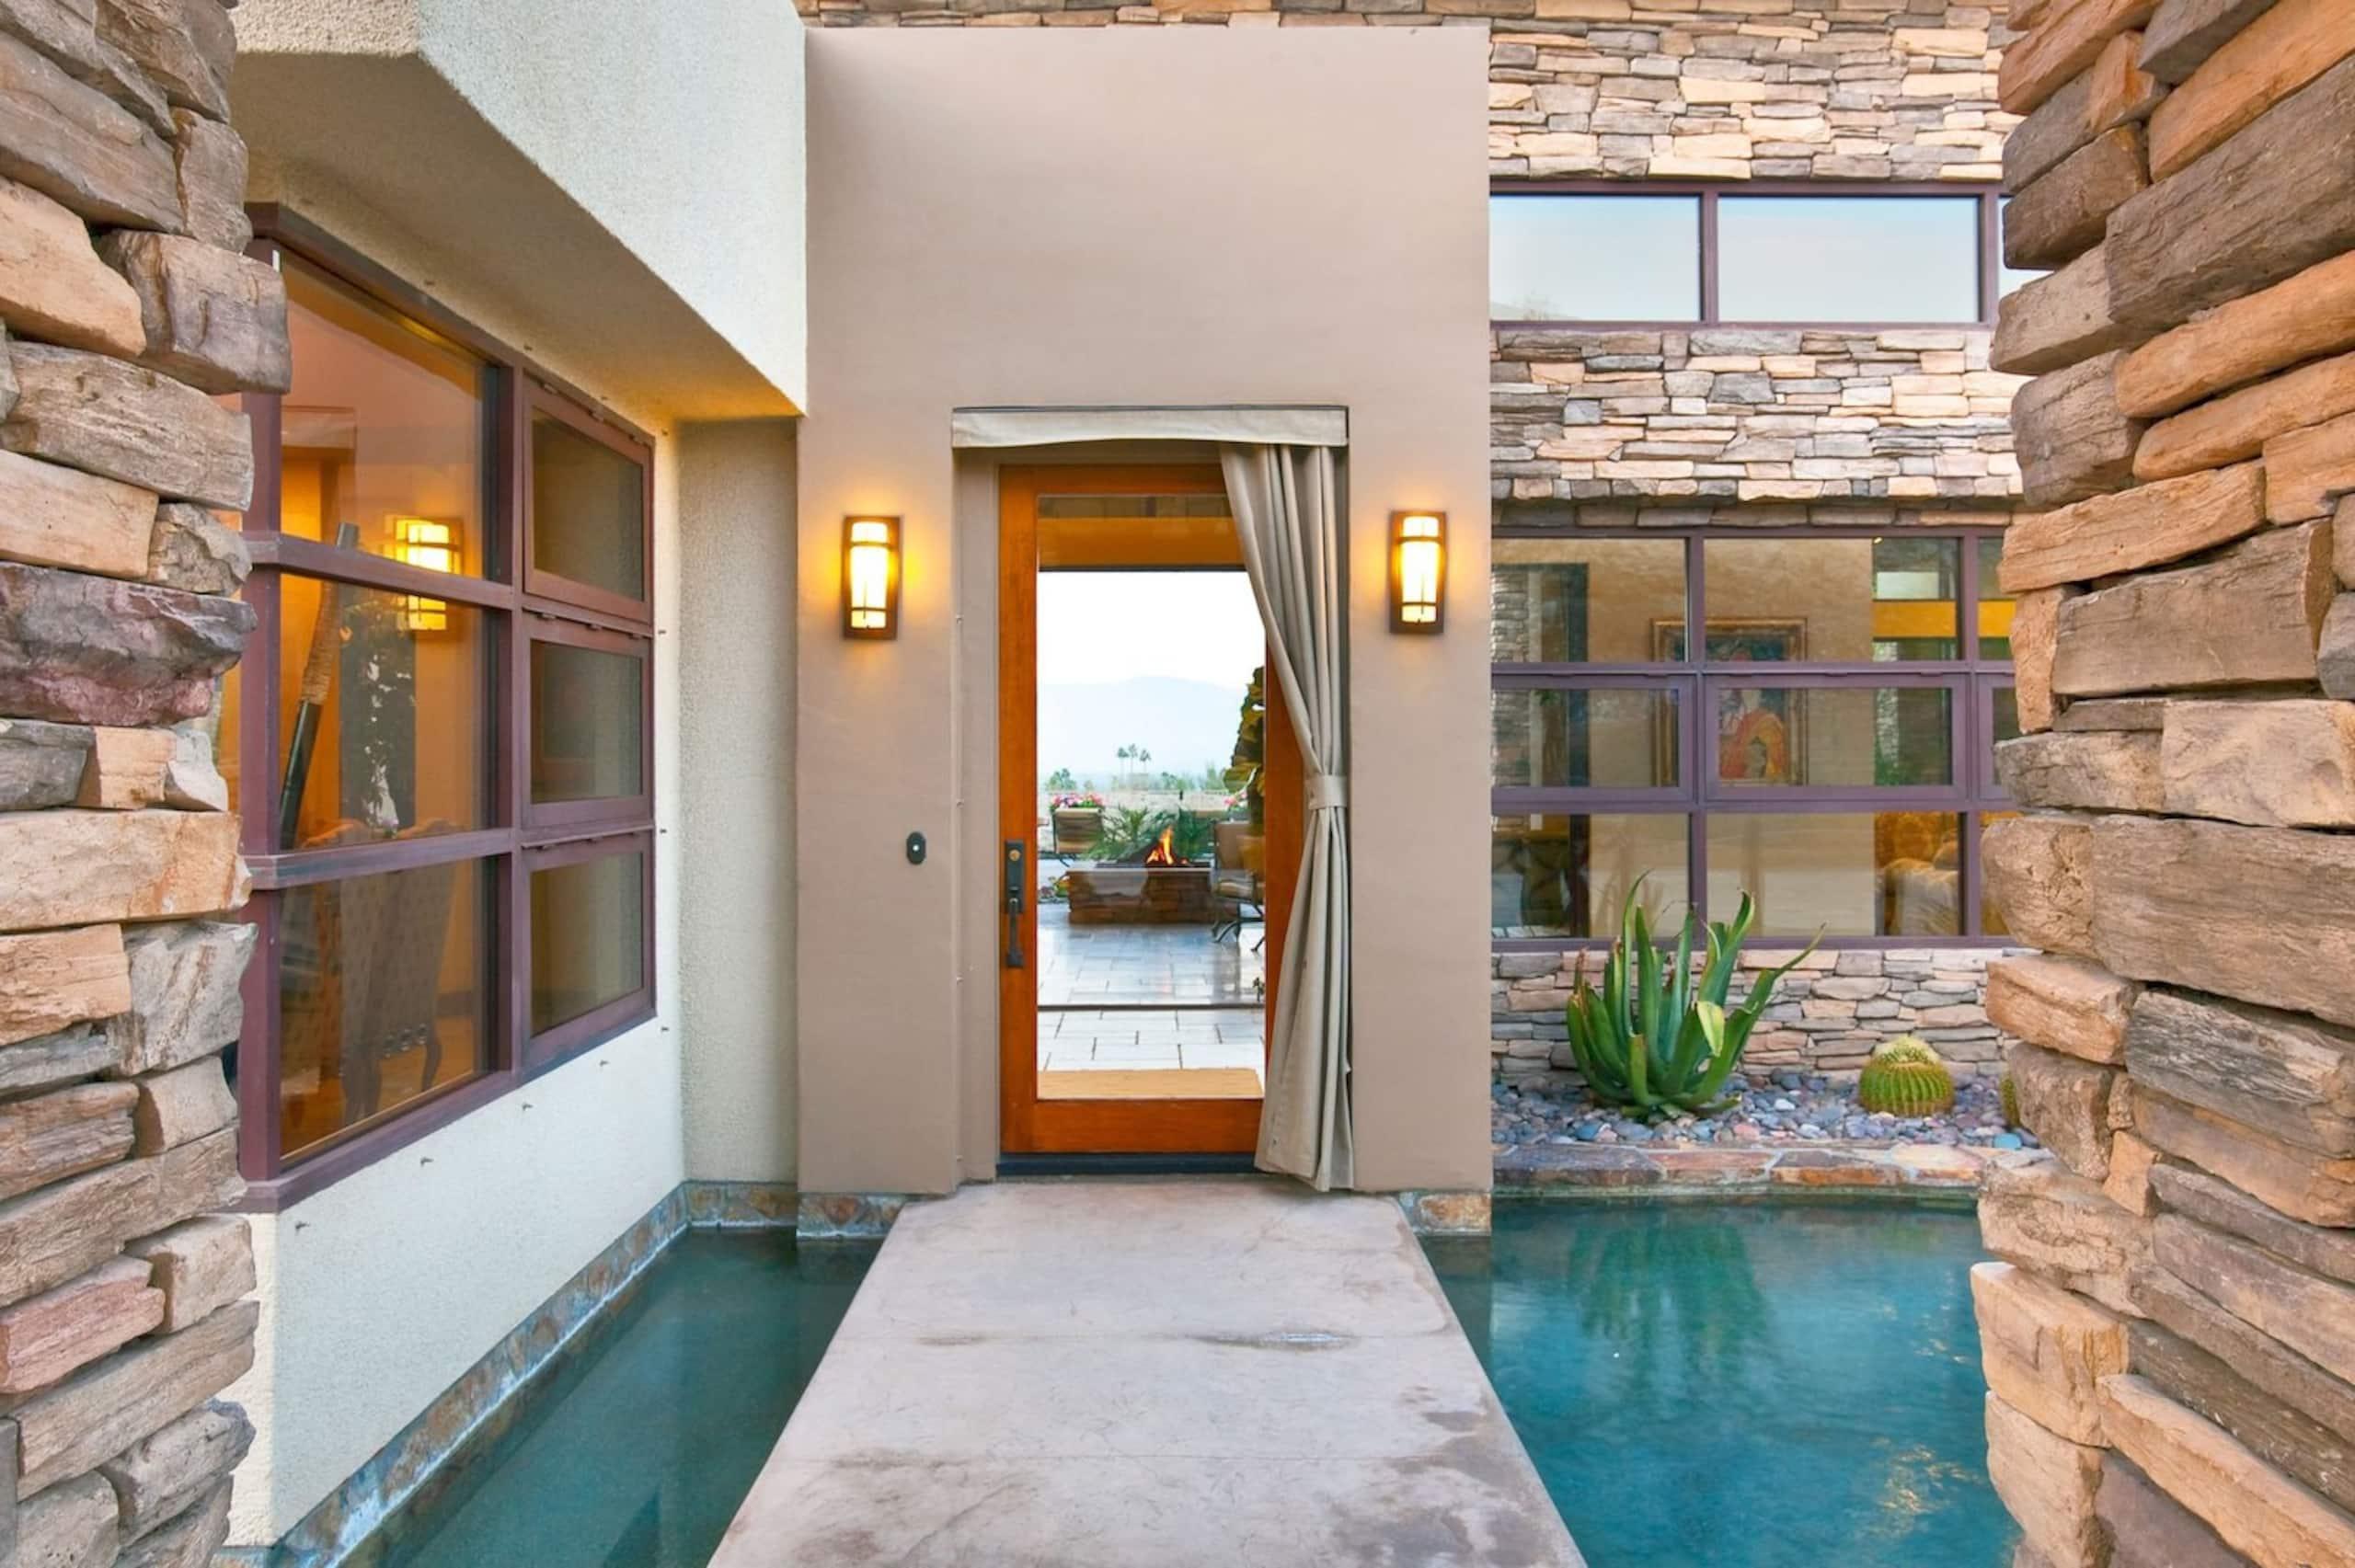 Apartment Villa Elmo - Marvelous 5 Bedrooms photo 20301314